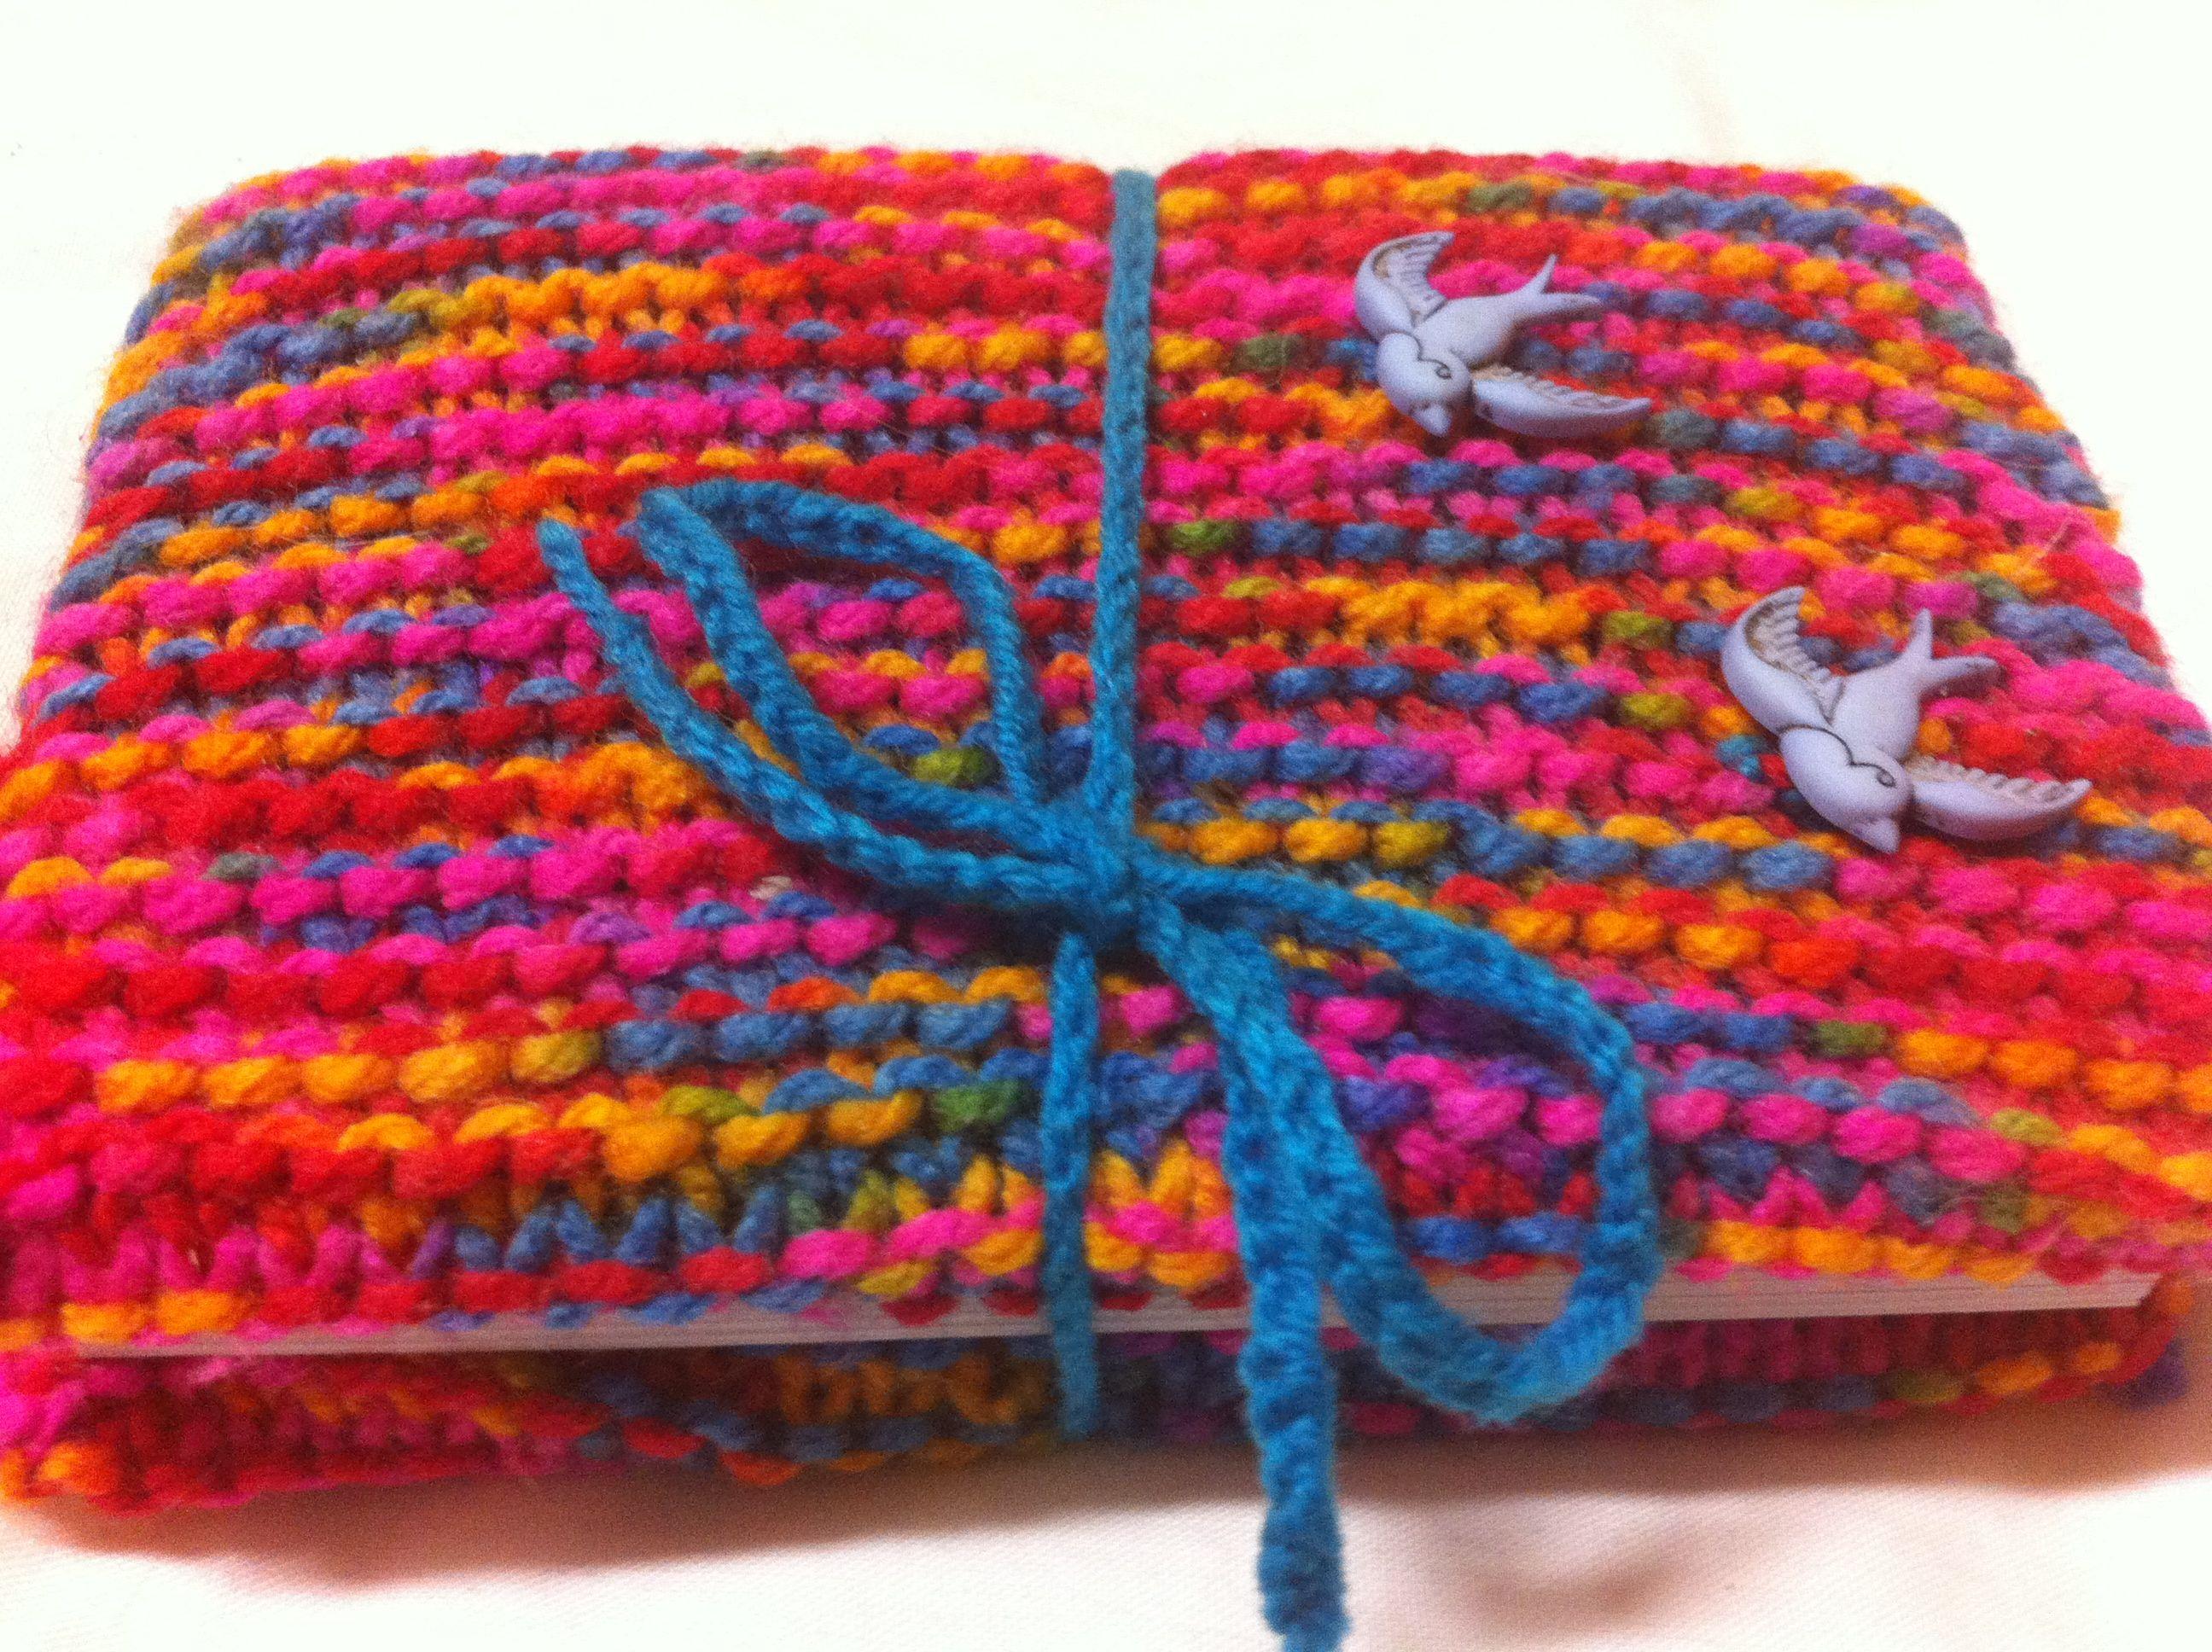 knitting YARN BOMBING Page 2